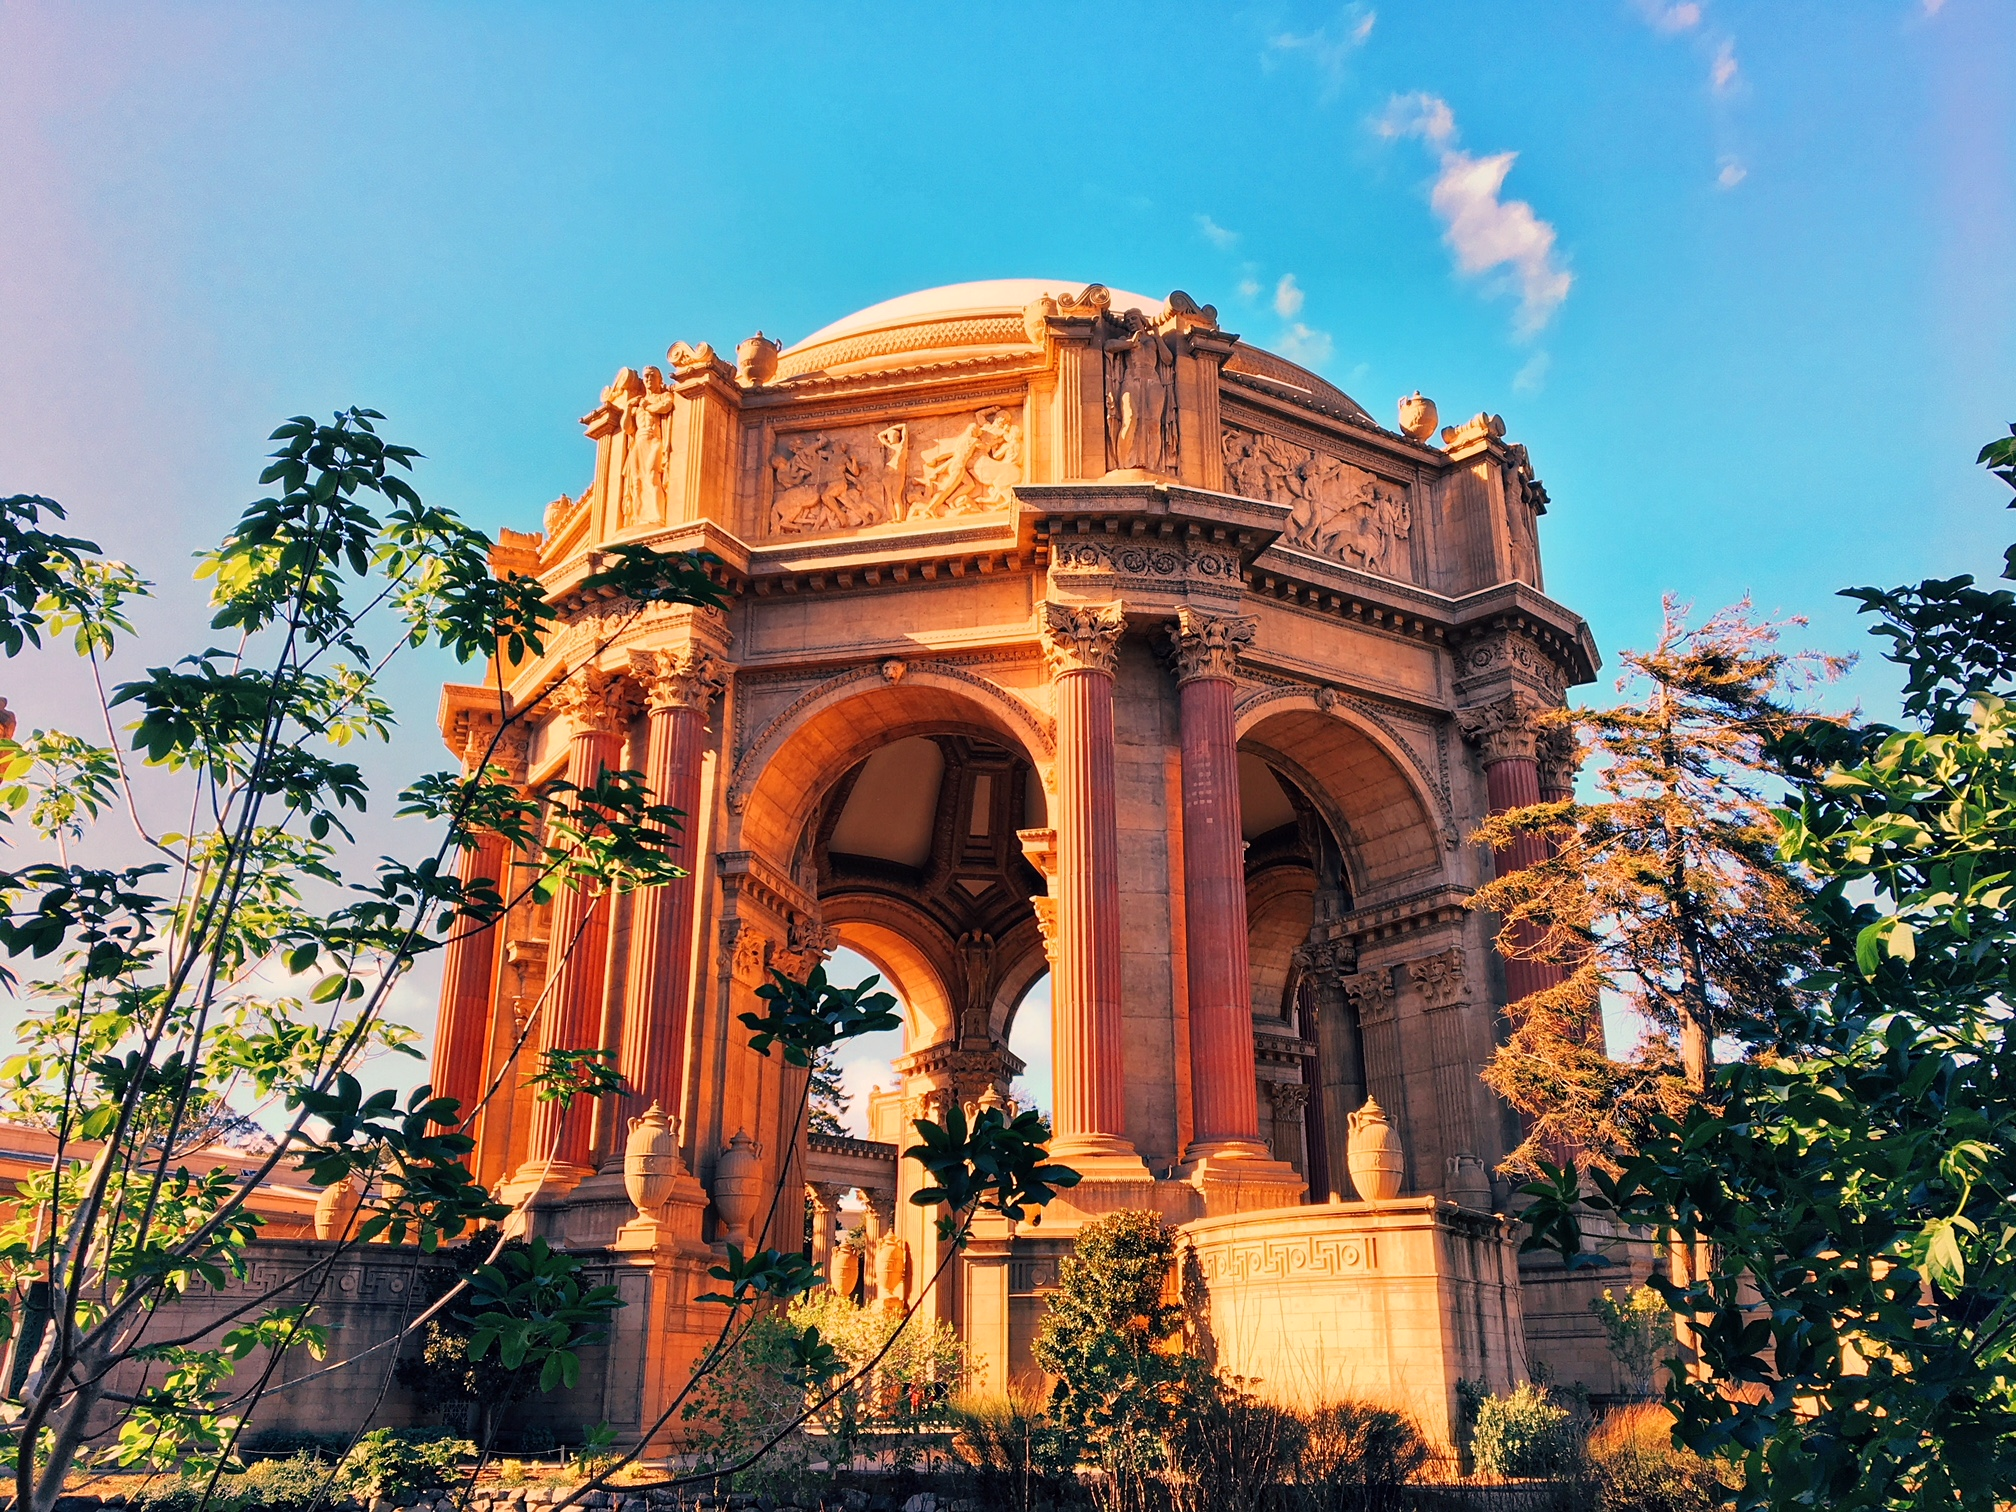 San Francisco, CA - Palace of fine arts